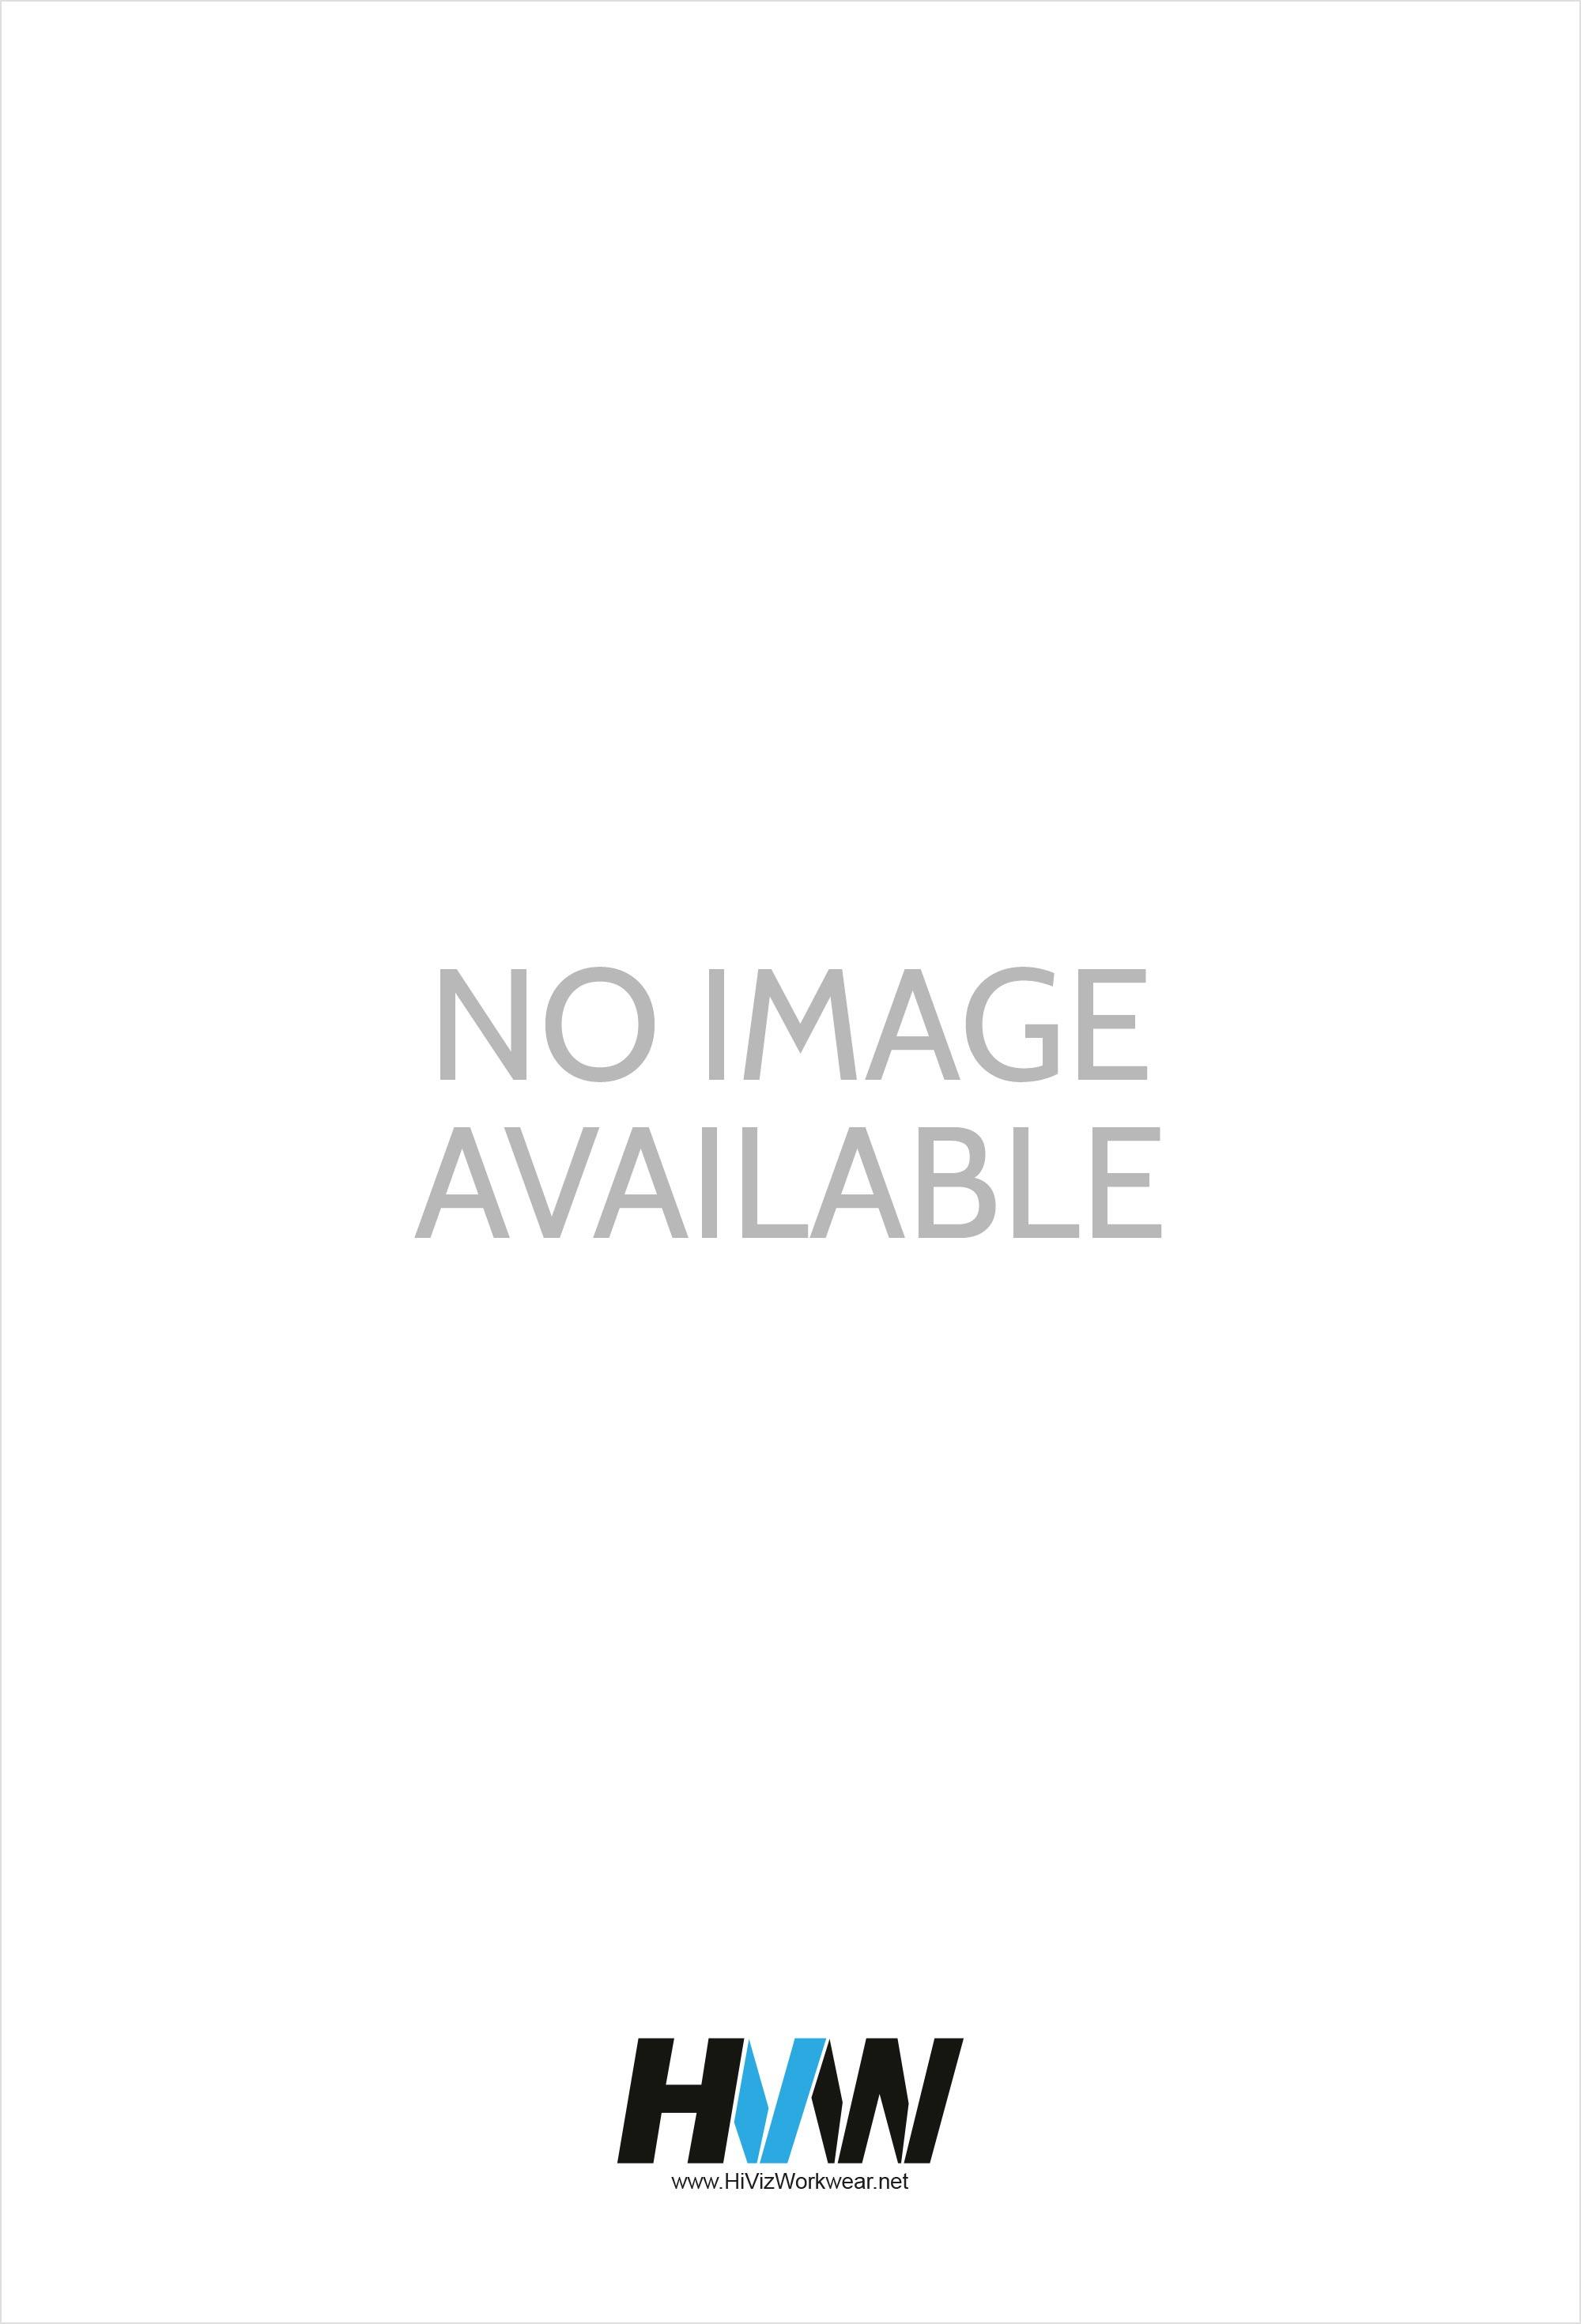 J266F Womens Authentic Zipped Hooded Sweatshirt (Xsmall to Xlarge)